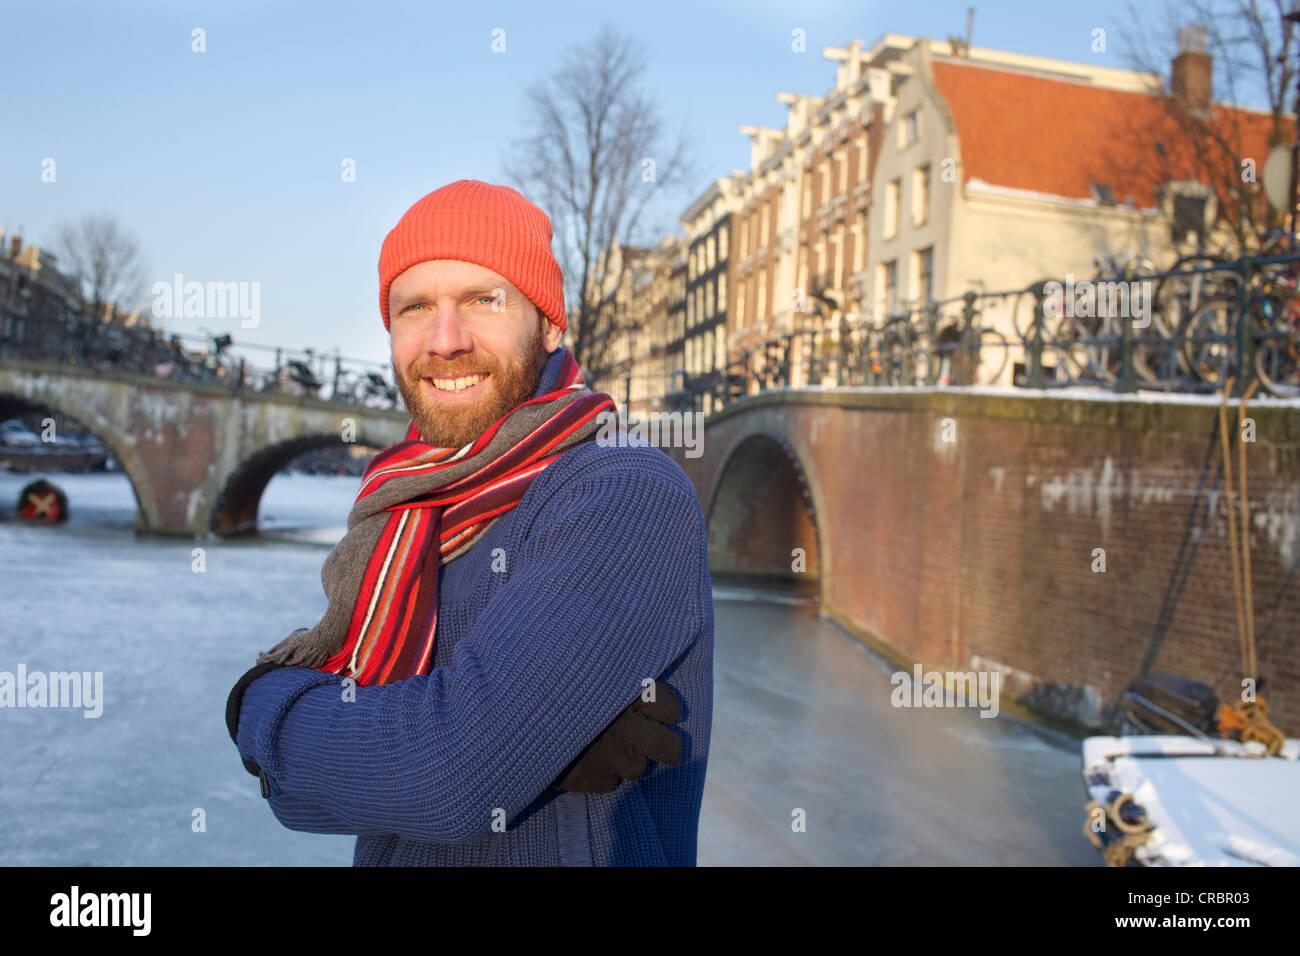 Man skating on frozen urban canal - Stock Image